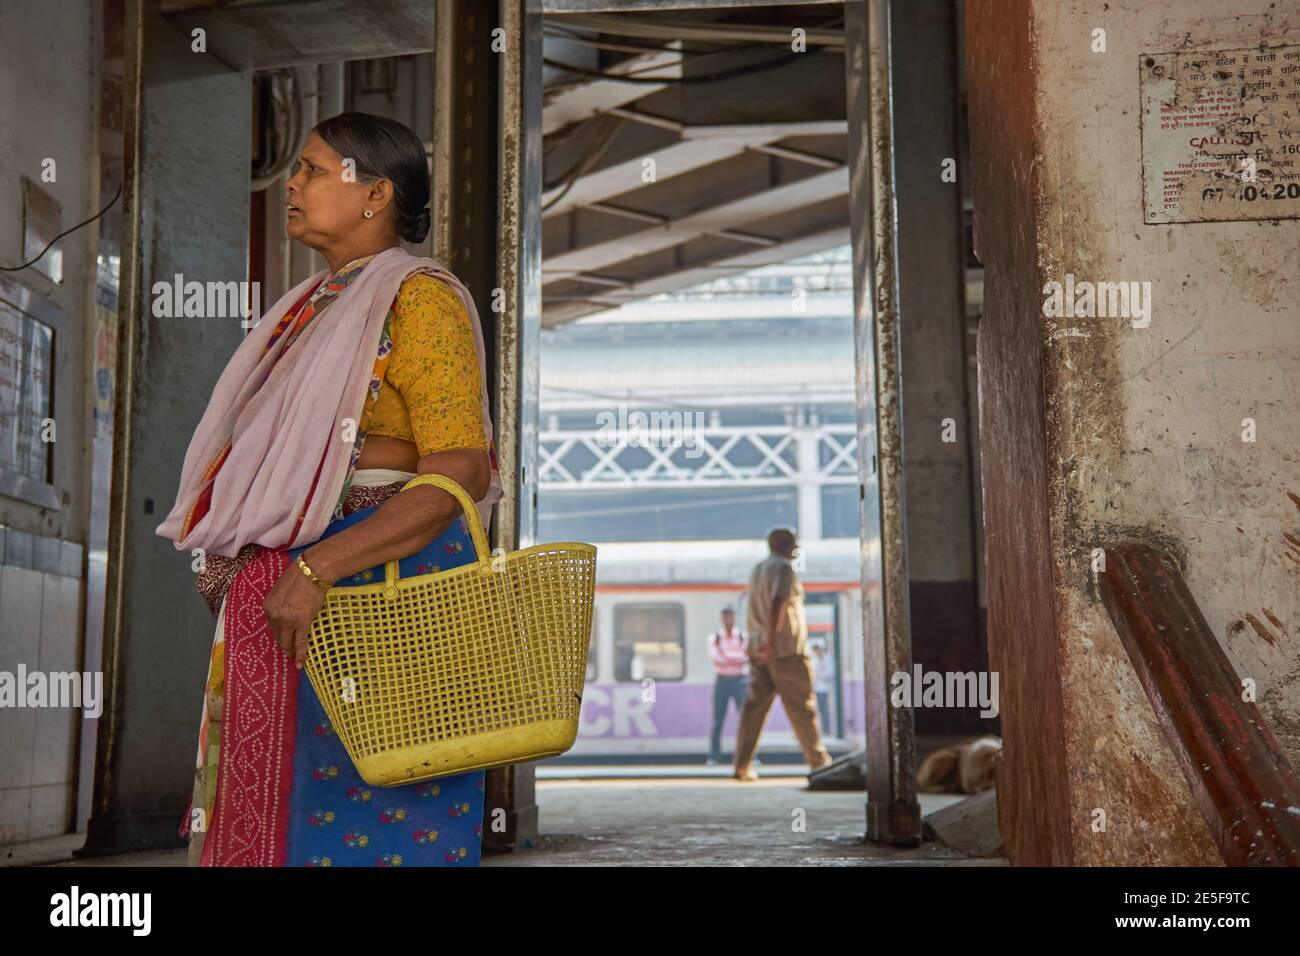 Having disembarked from a suburban train, a Mumbai housewife leaves Chhatrapati Shivaji Maharaj Terminus in Mumbai, the city's busiest railway station Stock Photo